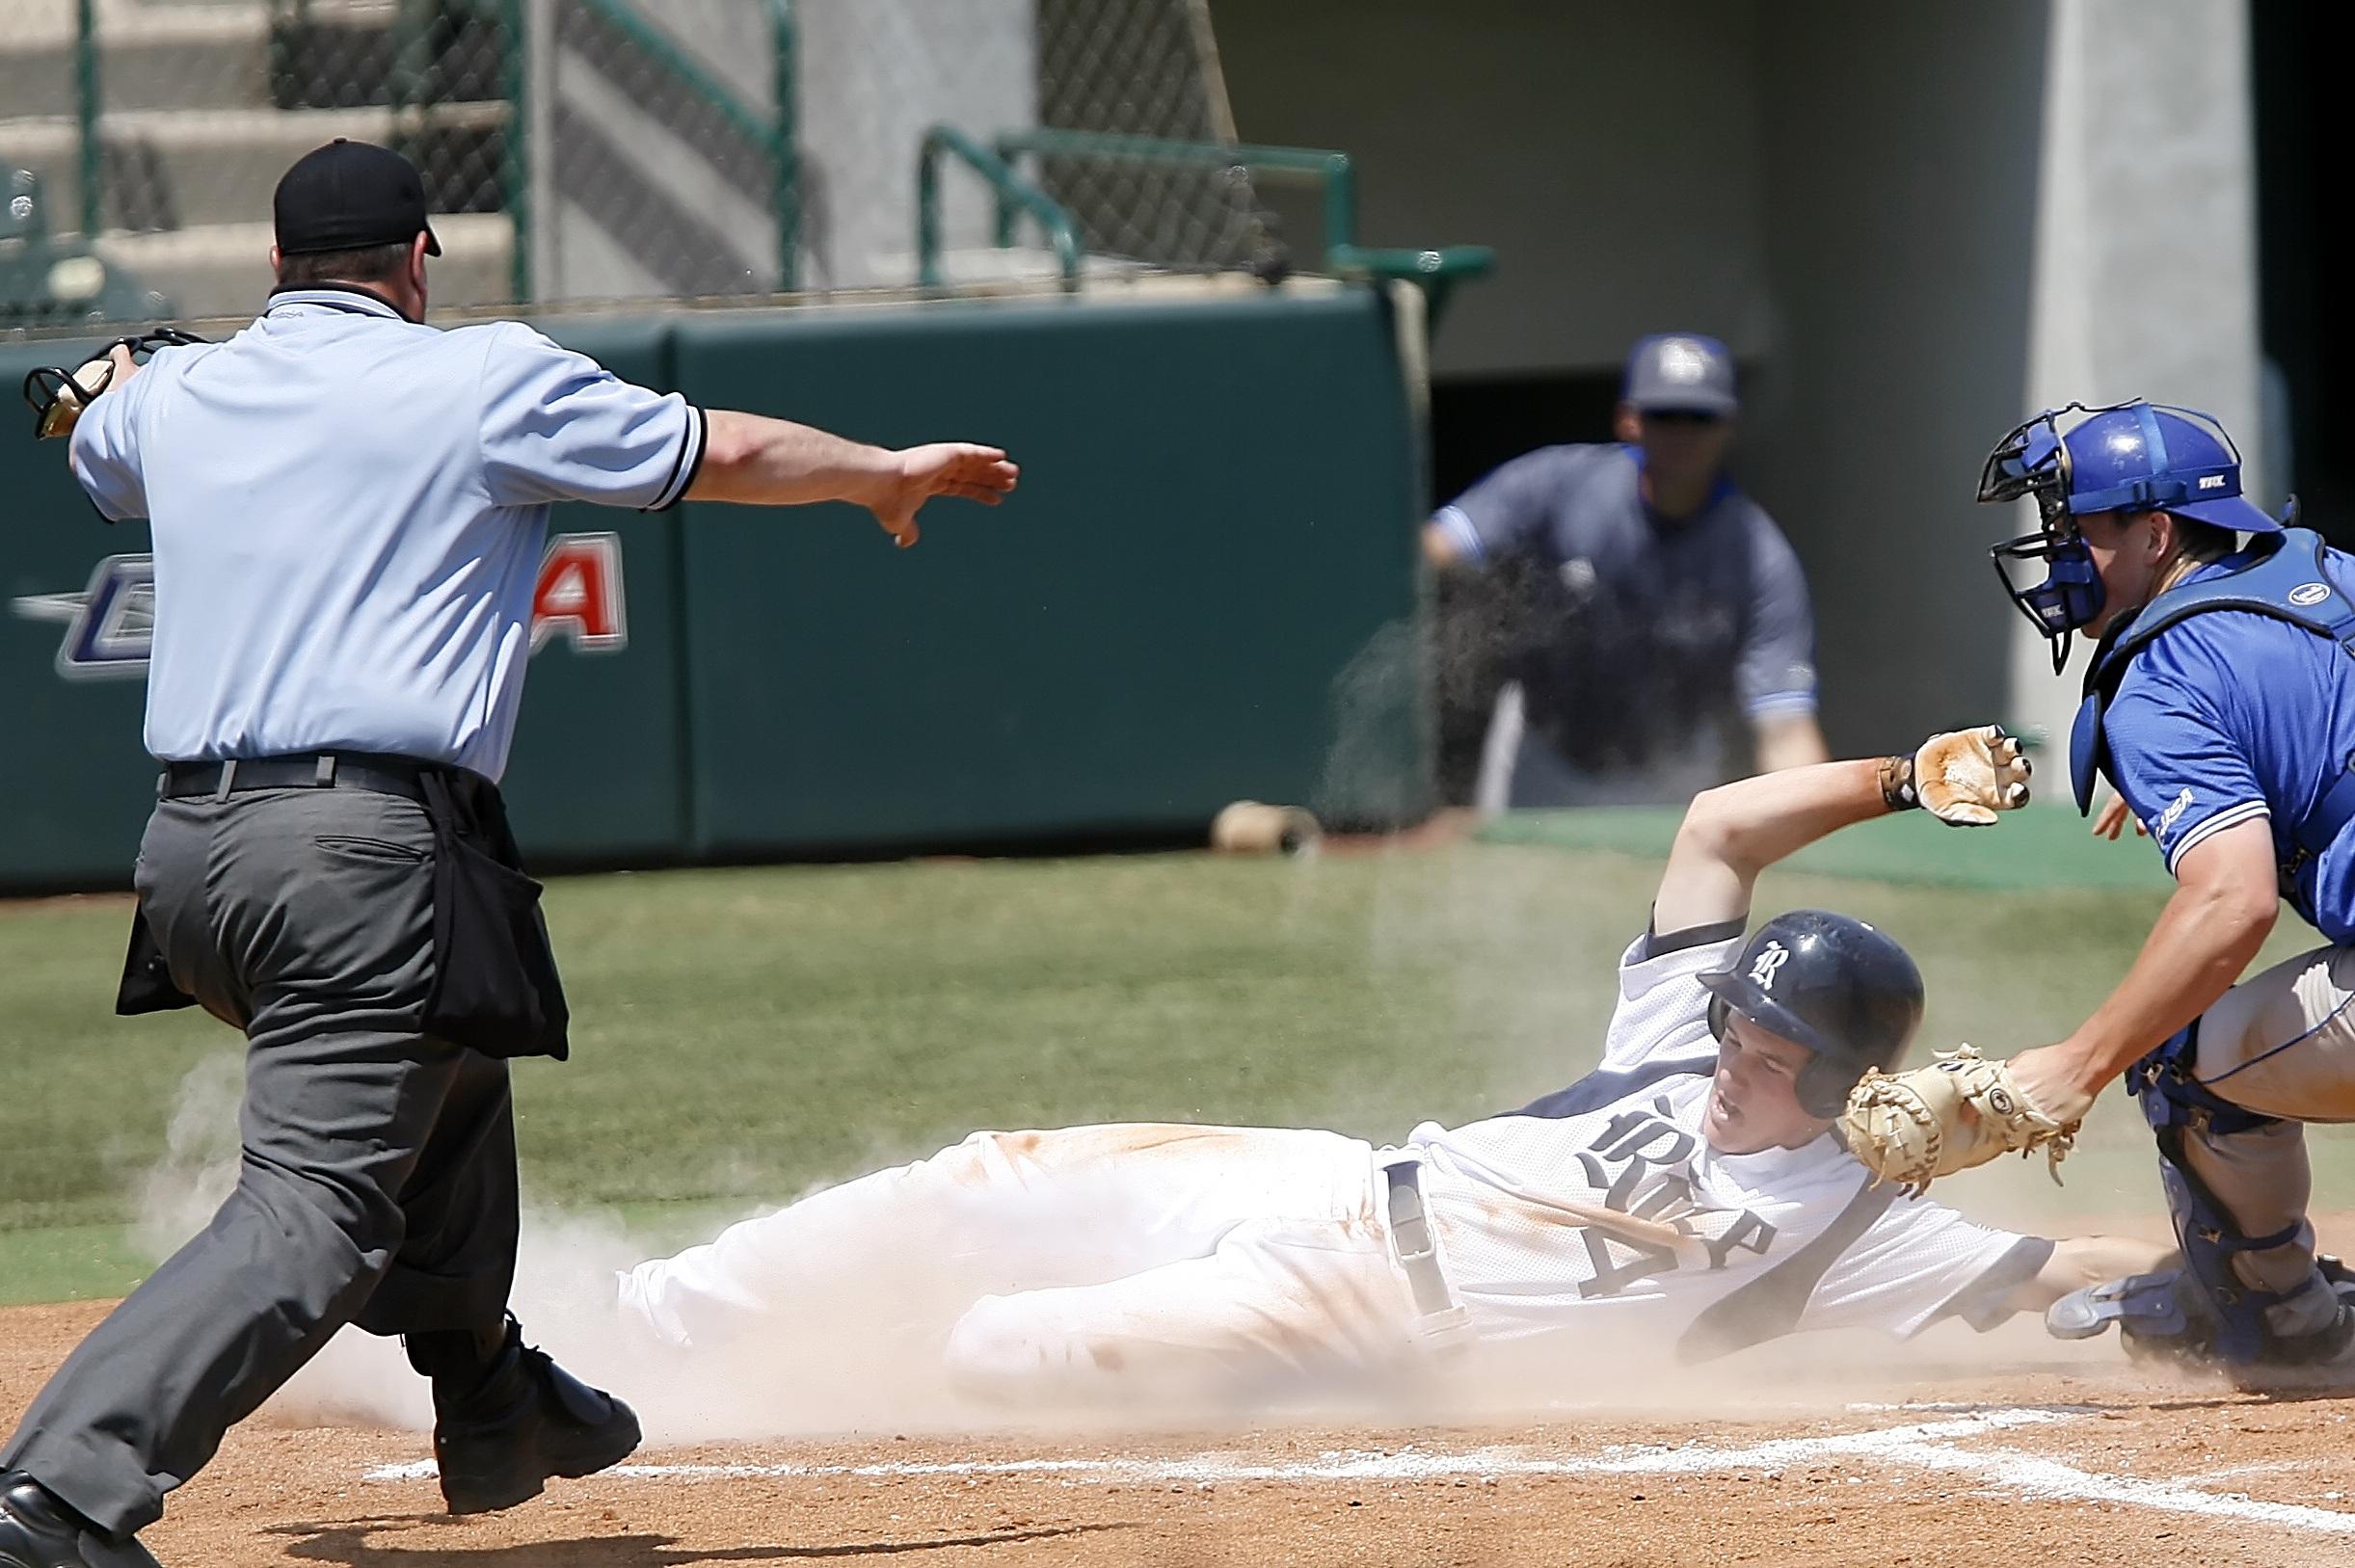 Man With White T Shirt Running to Baseball Home